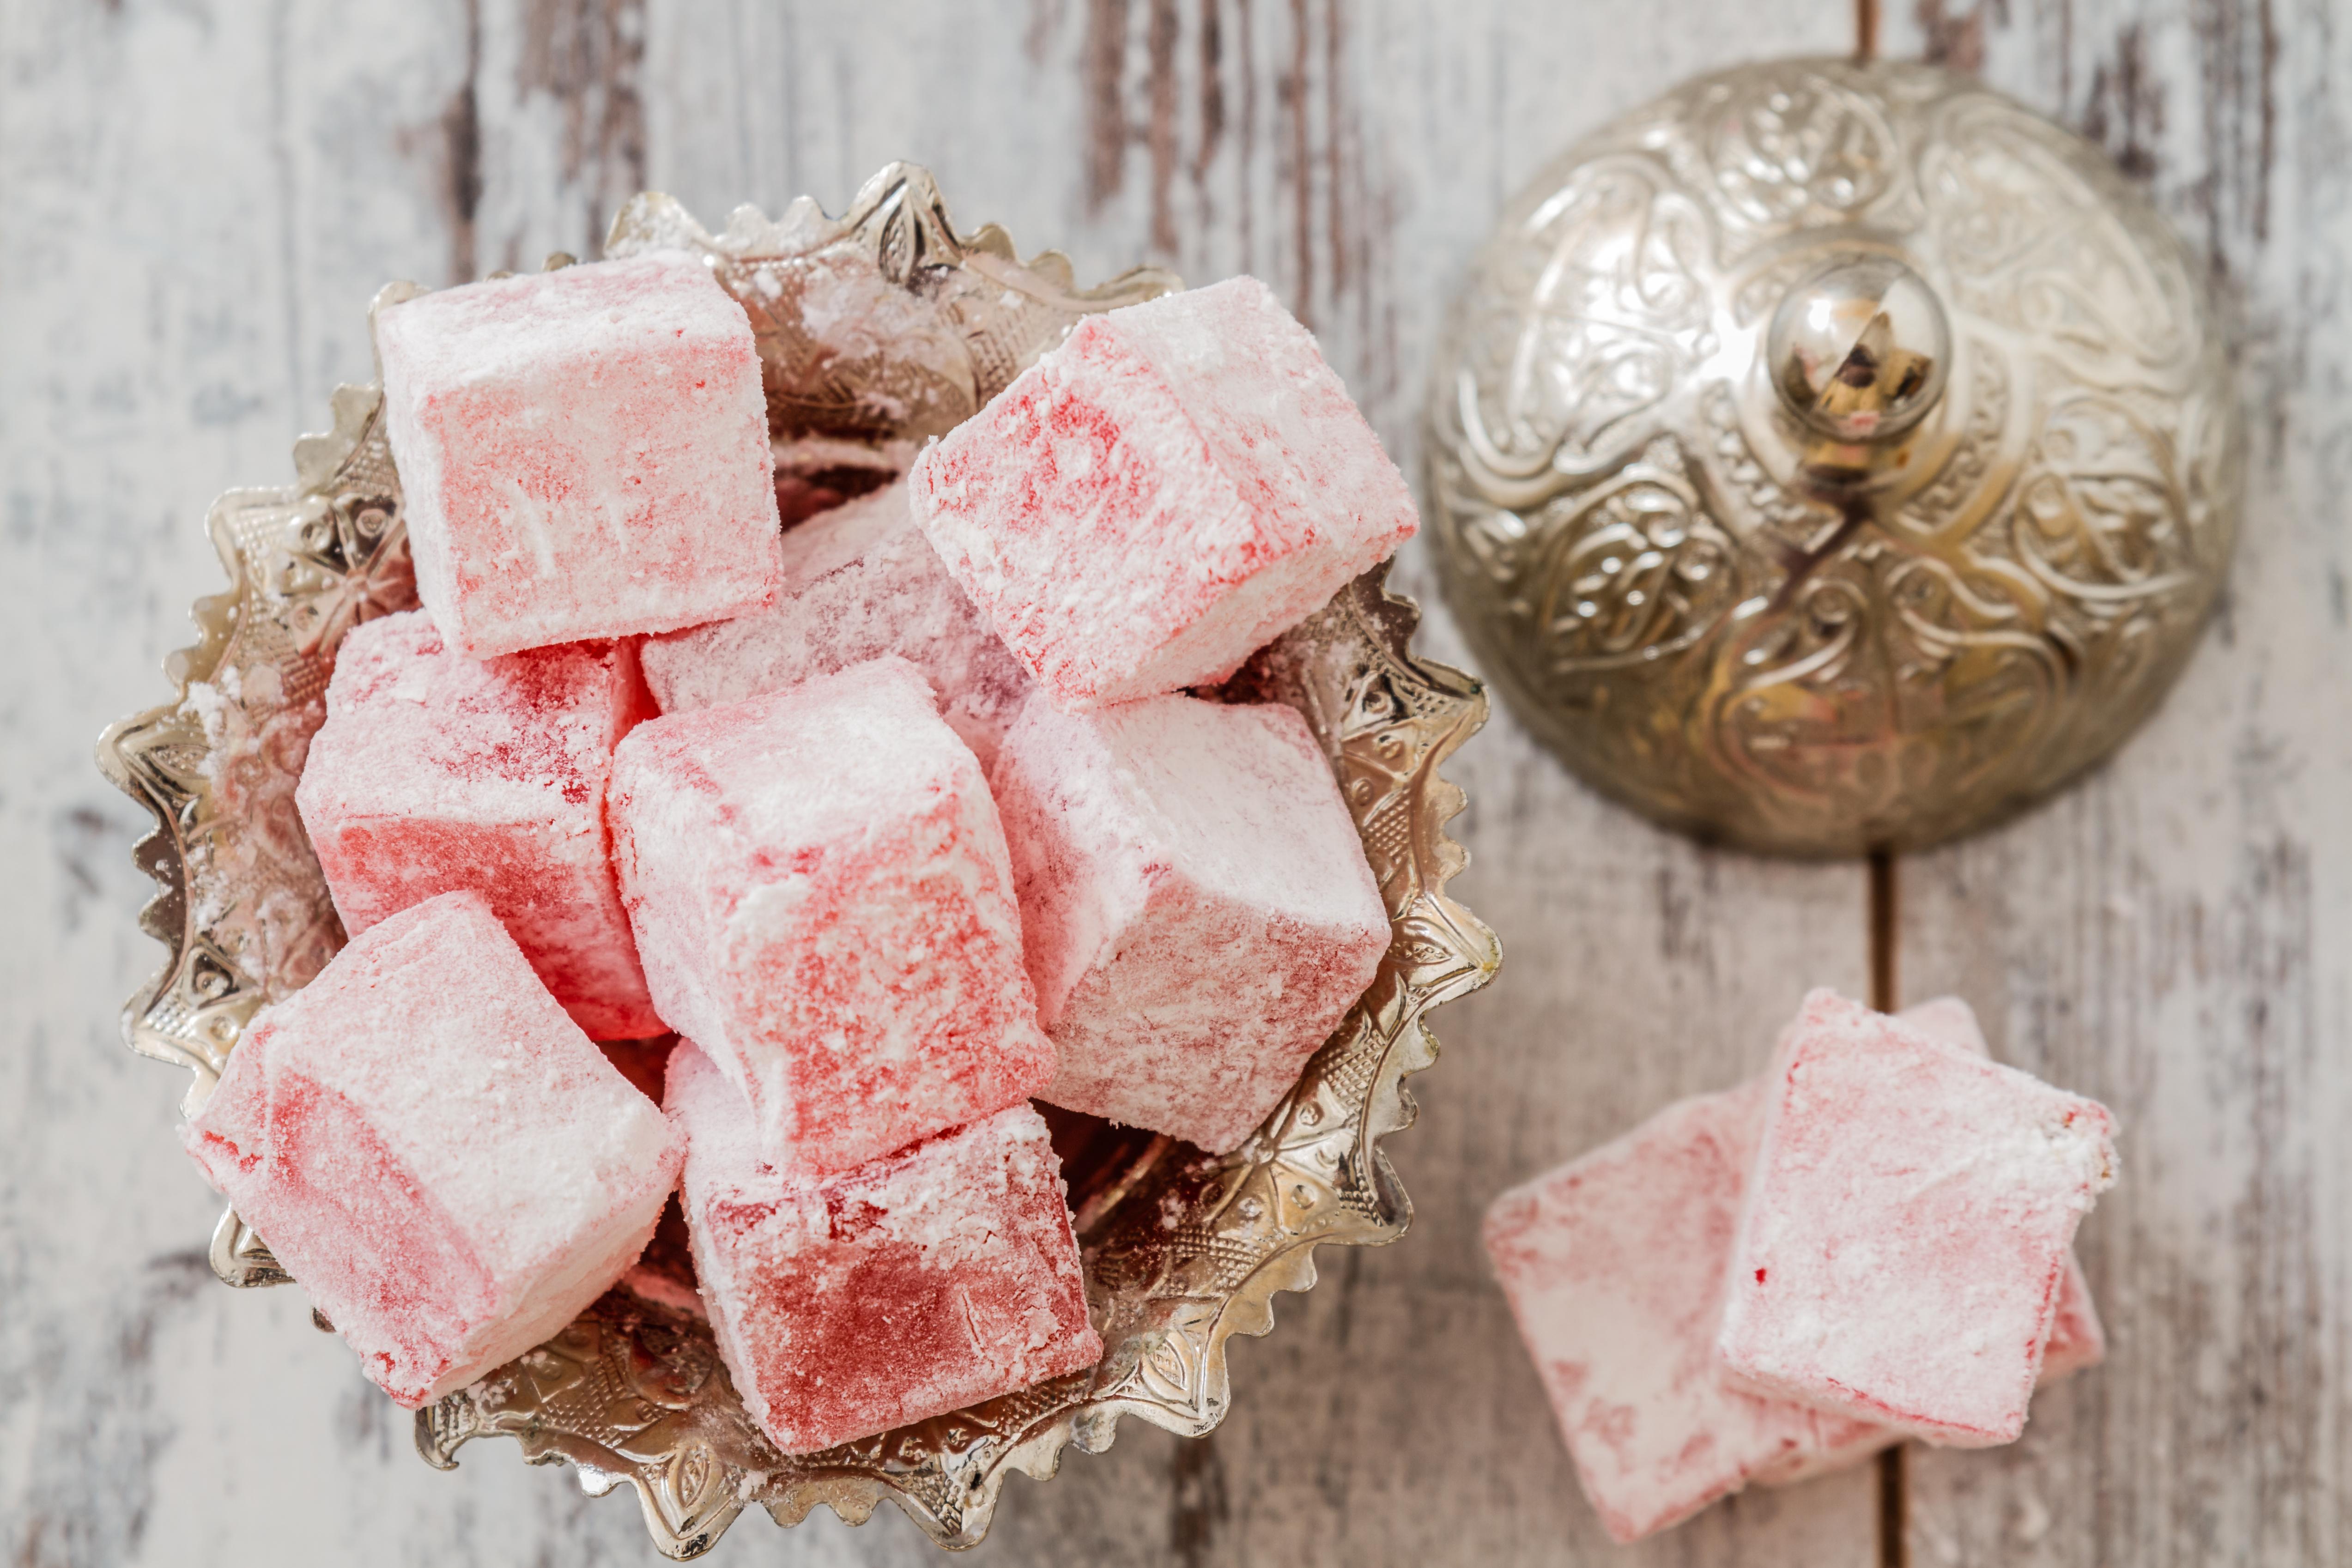 for Divan rose turkish delight